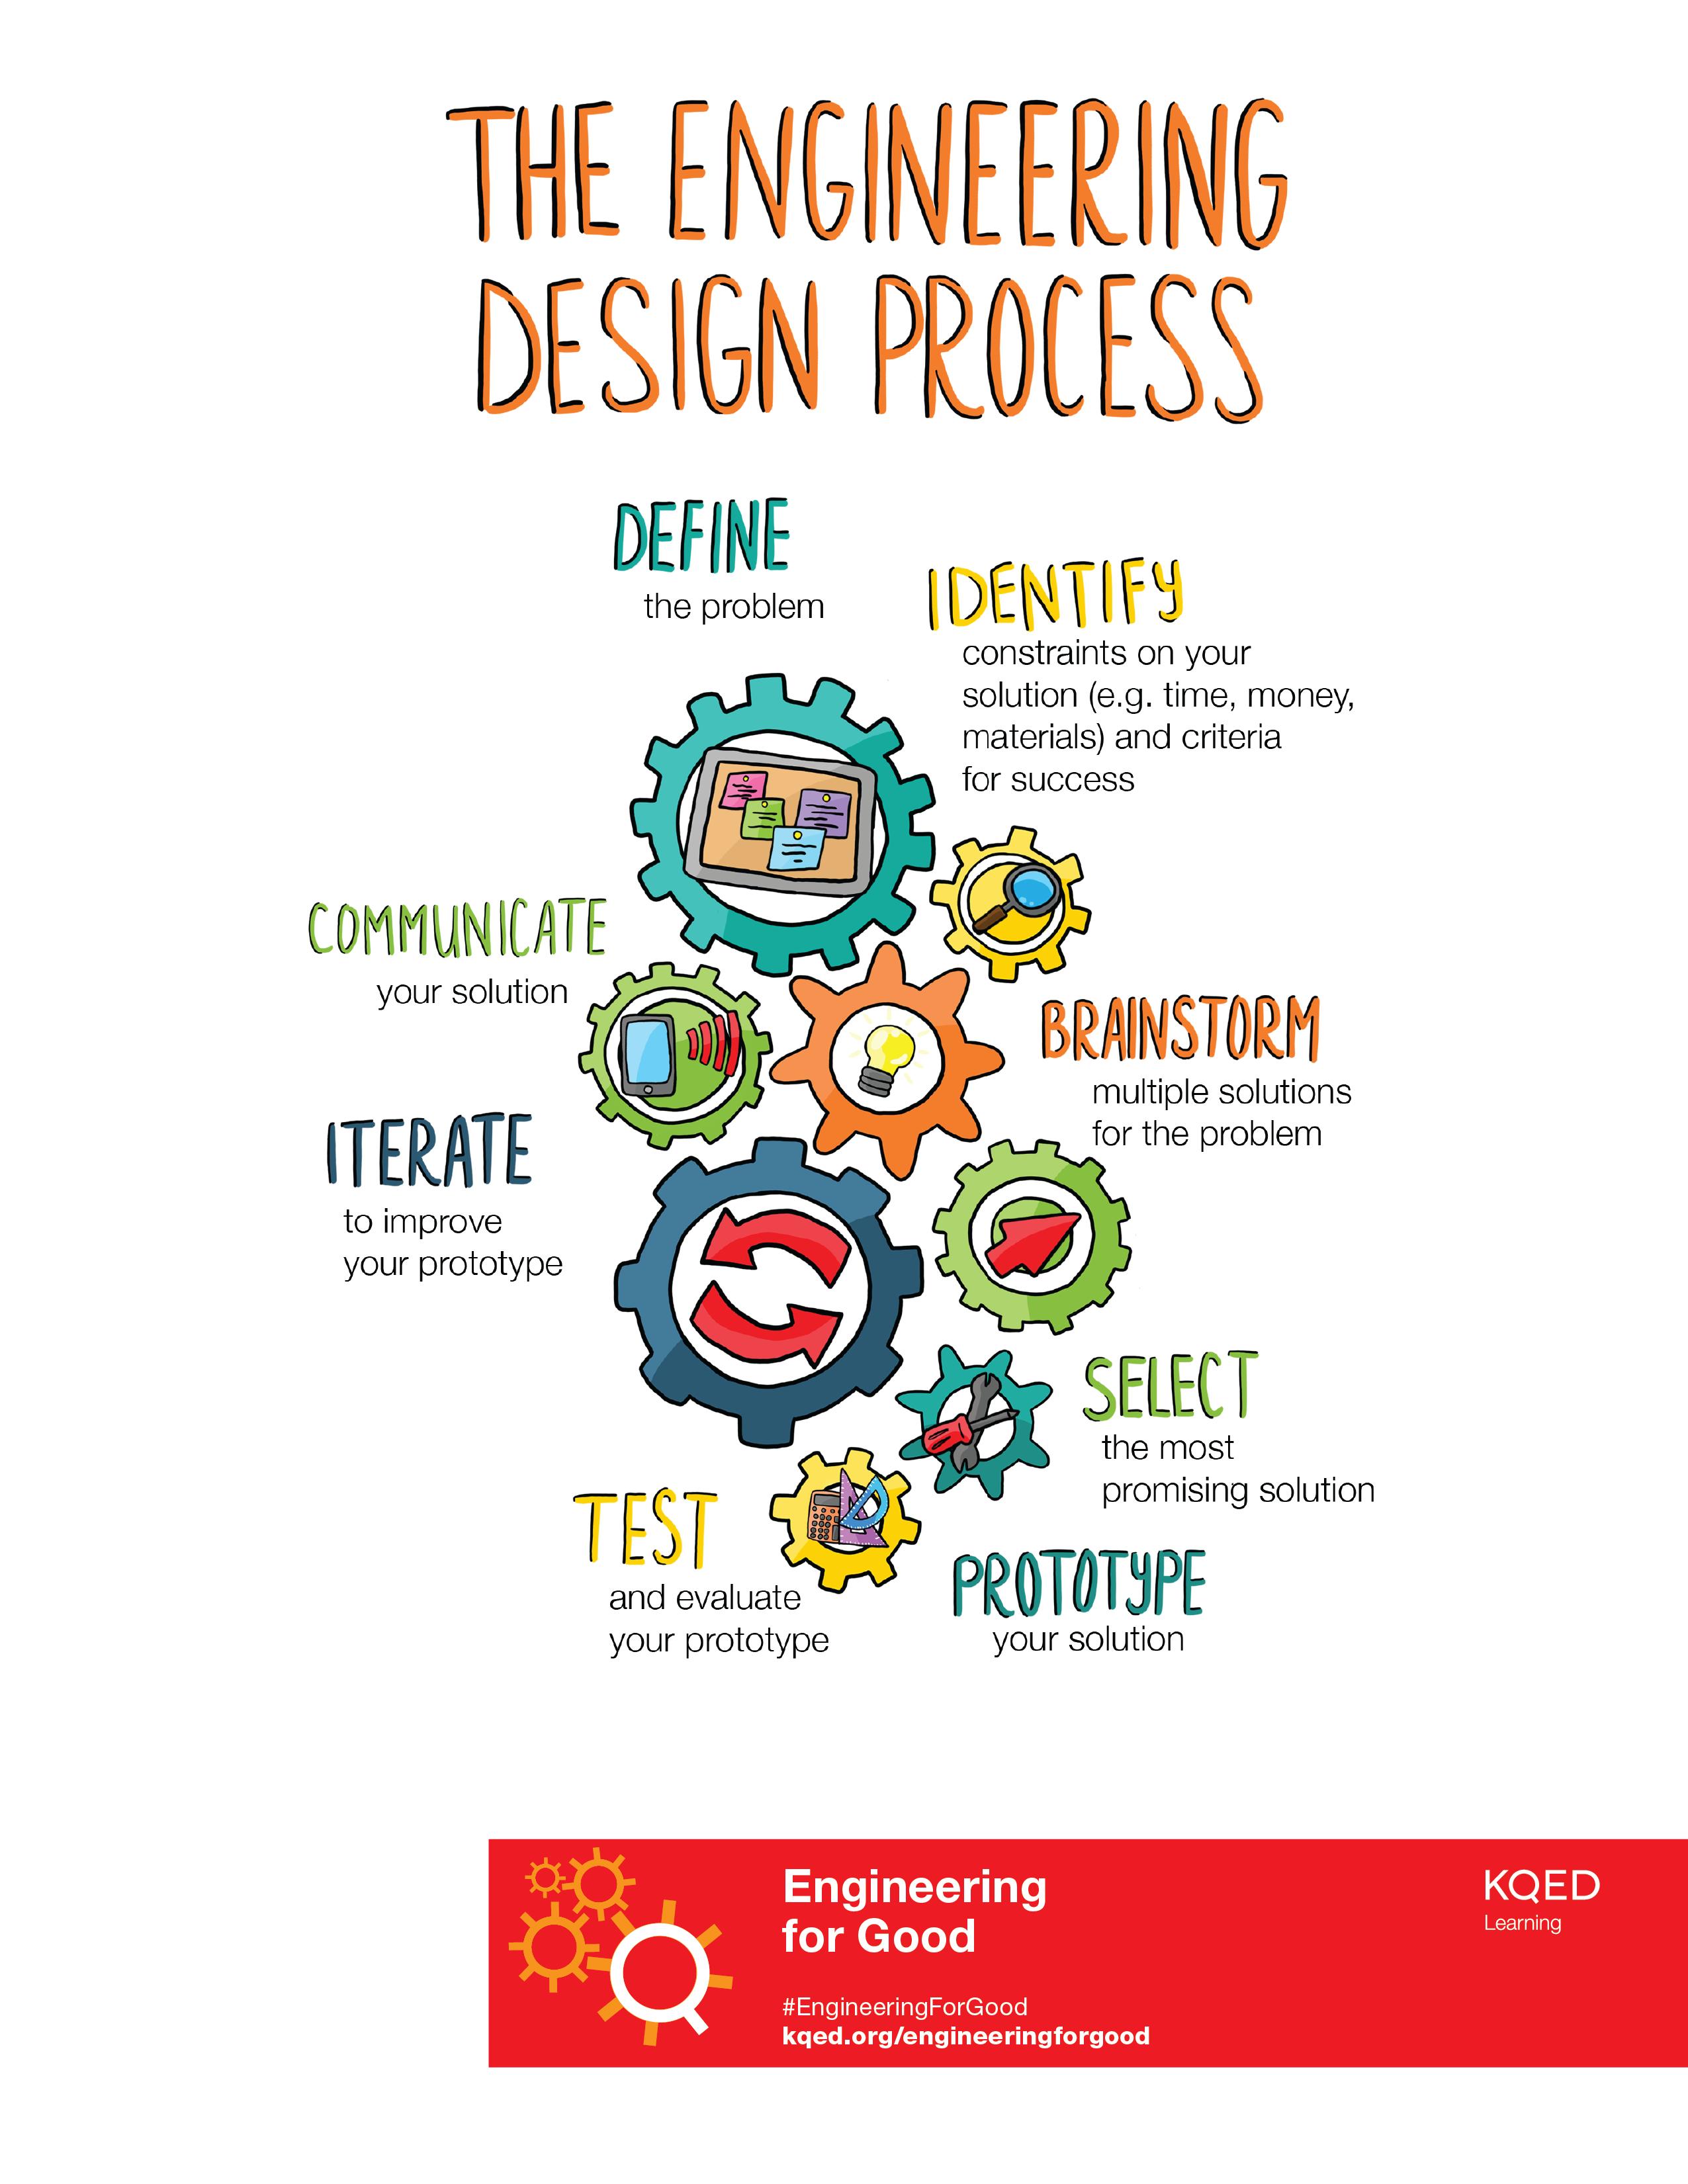 Engineering Design Process Illustration Engineering For Good Pbs Learningmedia